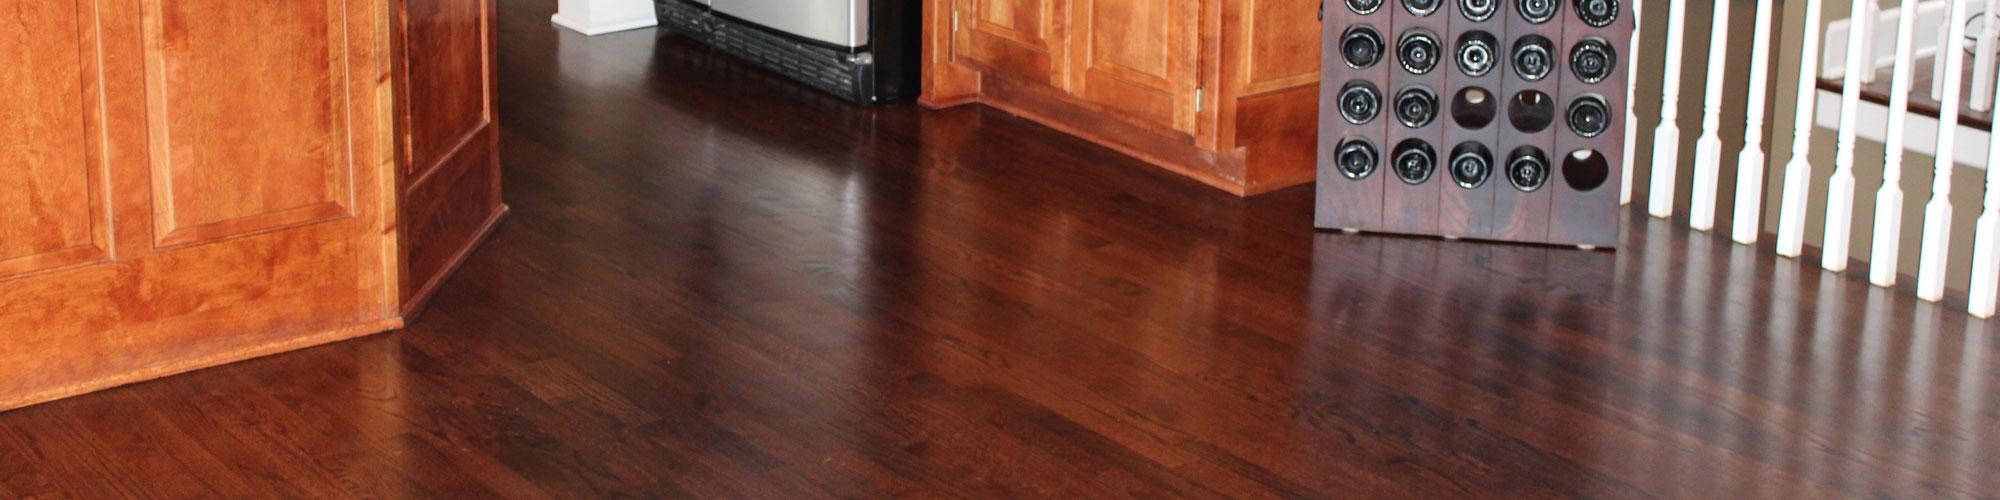 Dark Hardwood Floors Hardwood Floor Refinishing